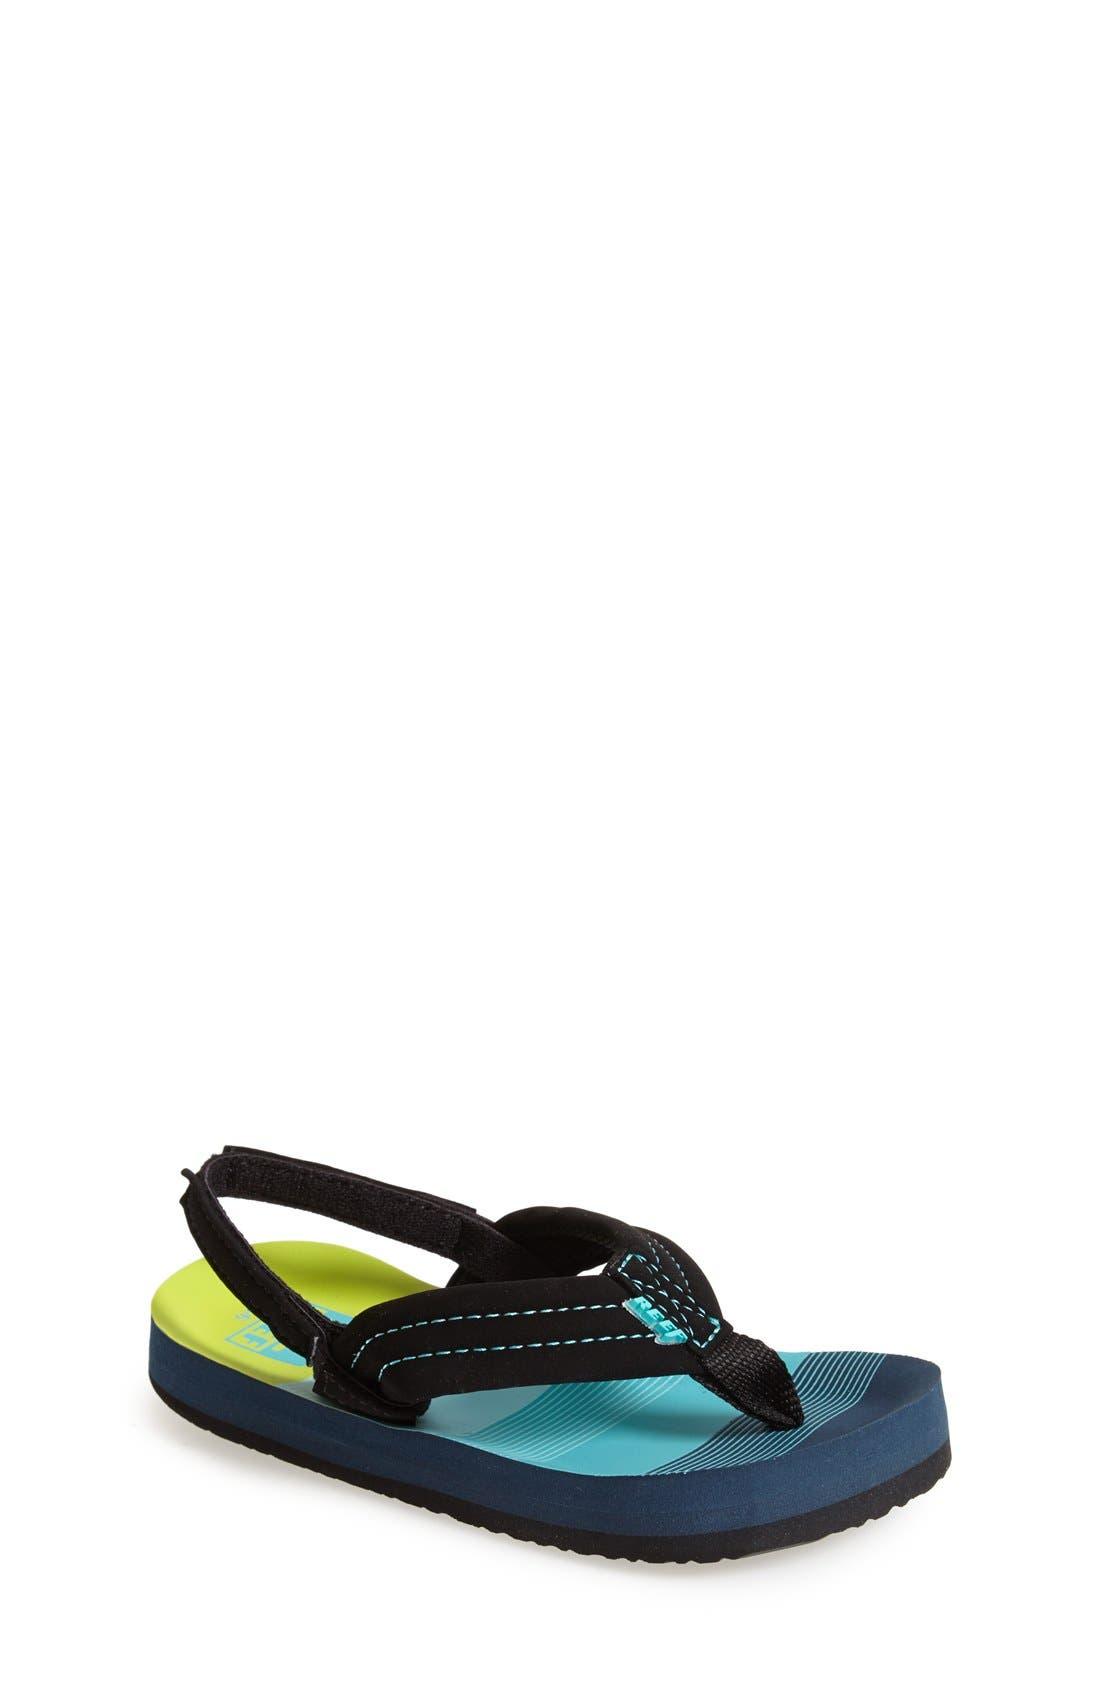 REEF, 'Ahi - Stripes' Sandal, Main thumbnail 1, color, AQUA/ GREEN